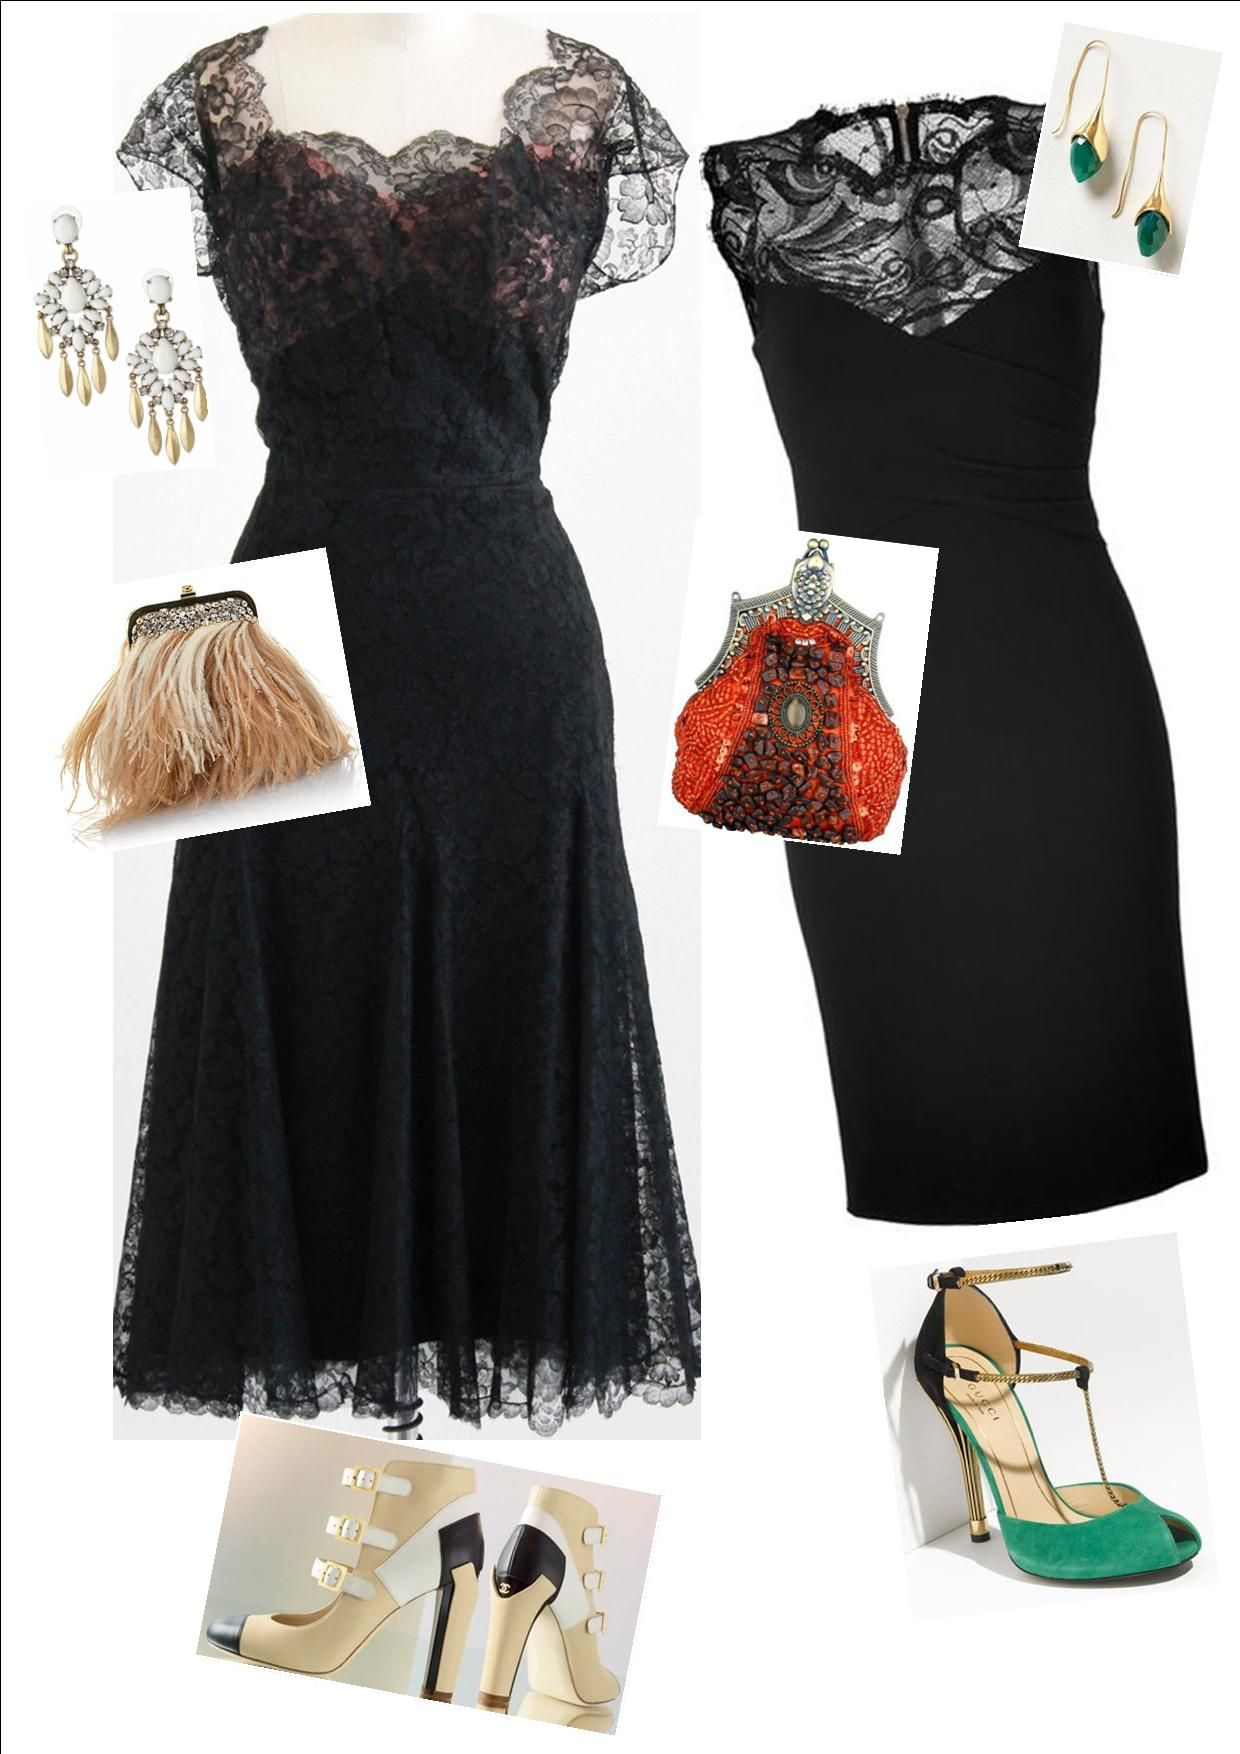 273bb4e2ce how to accessorise a black lace dress - Google Search